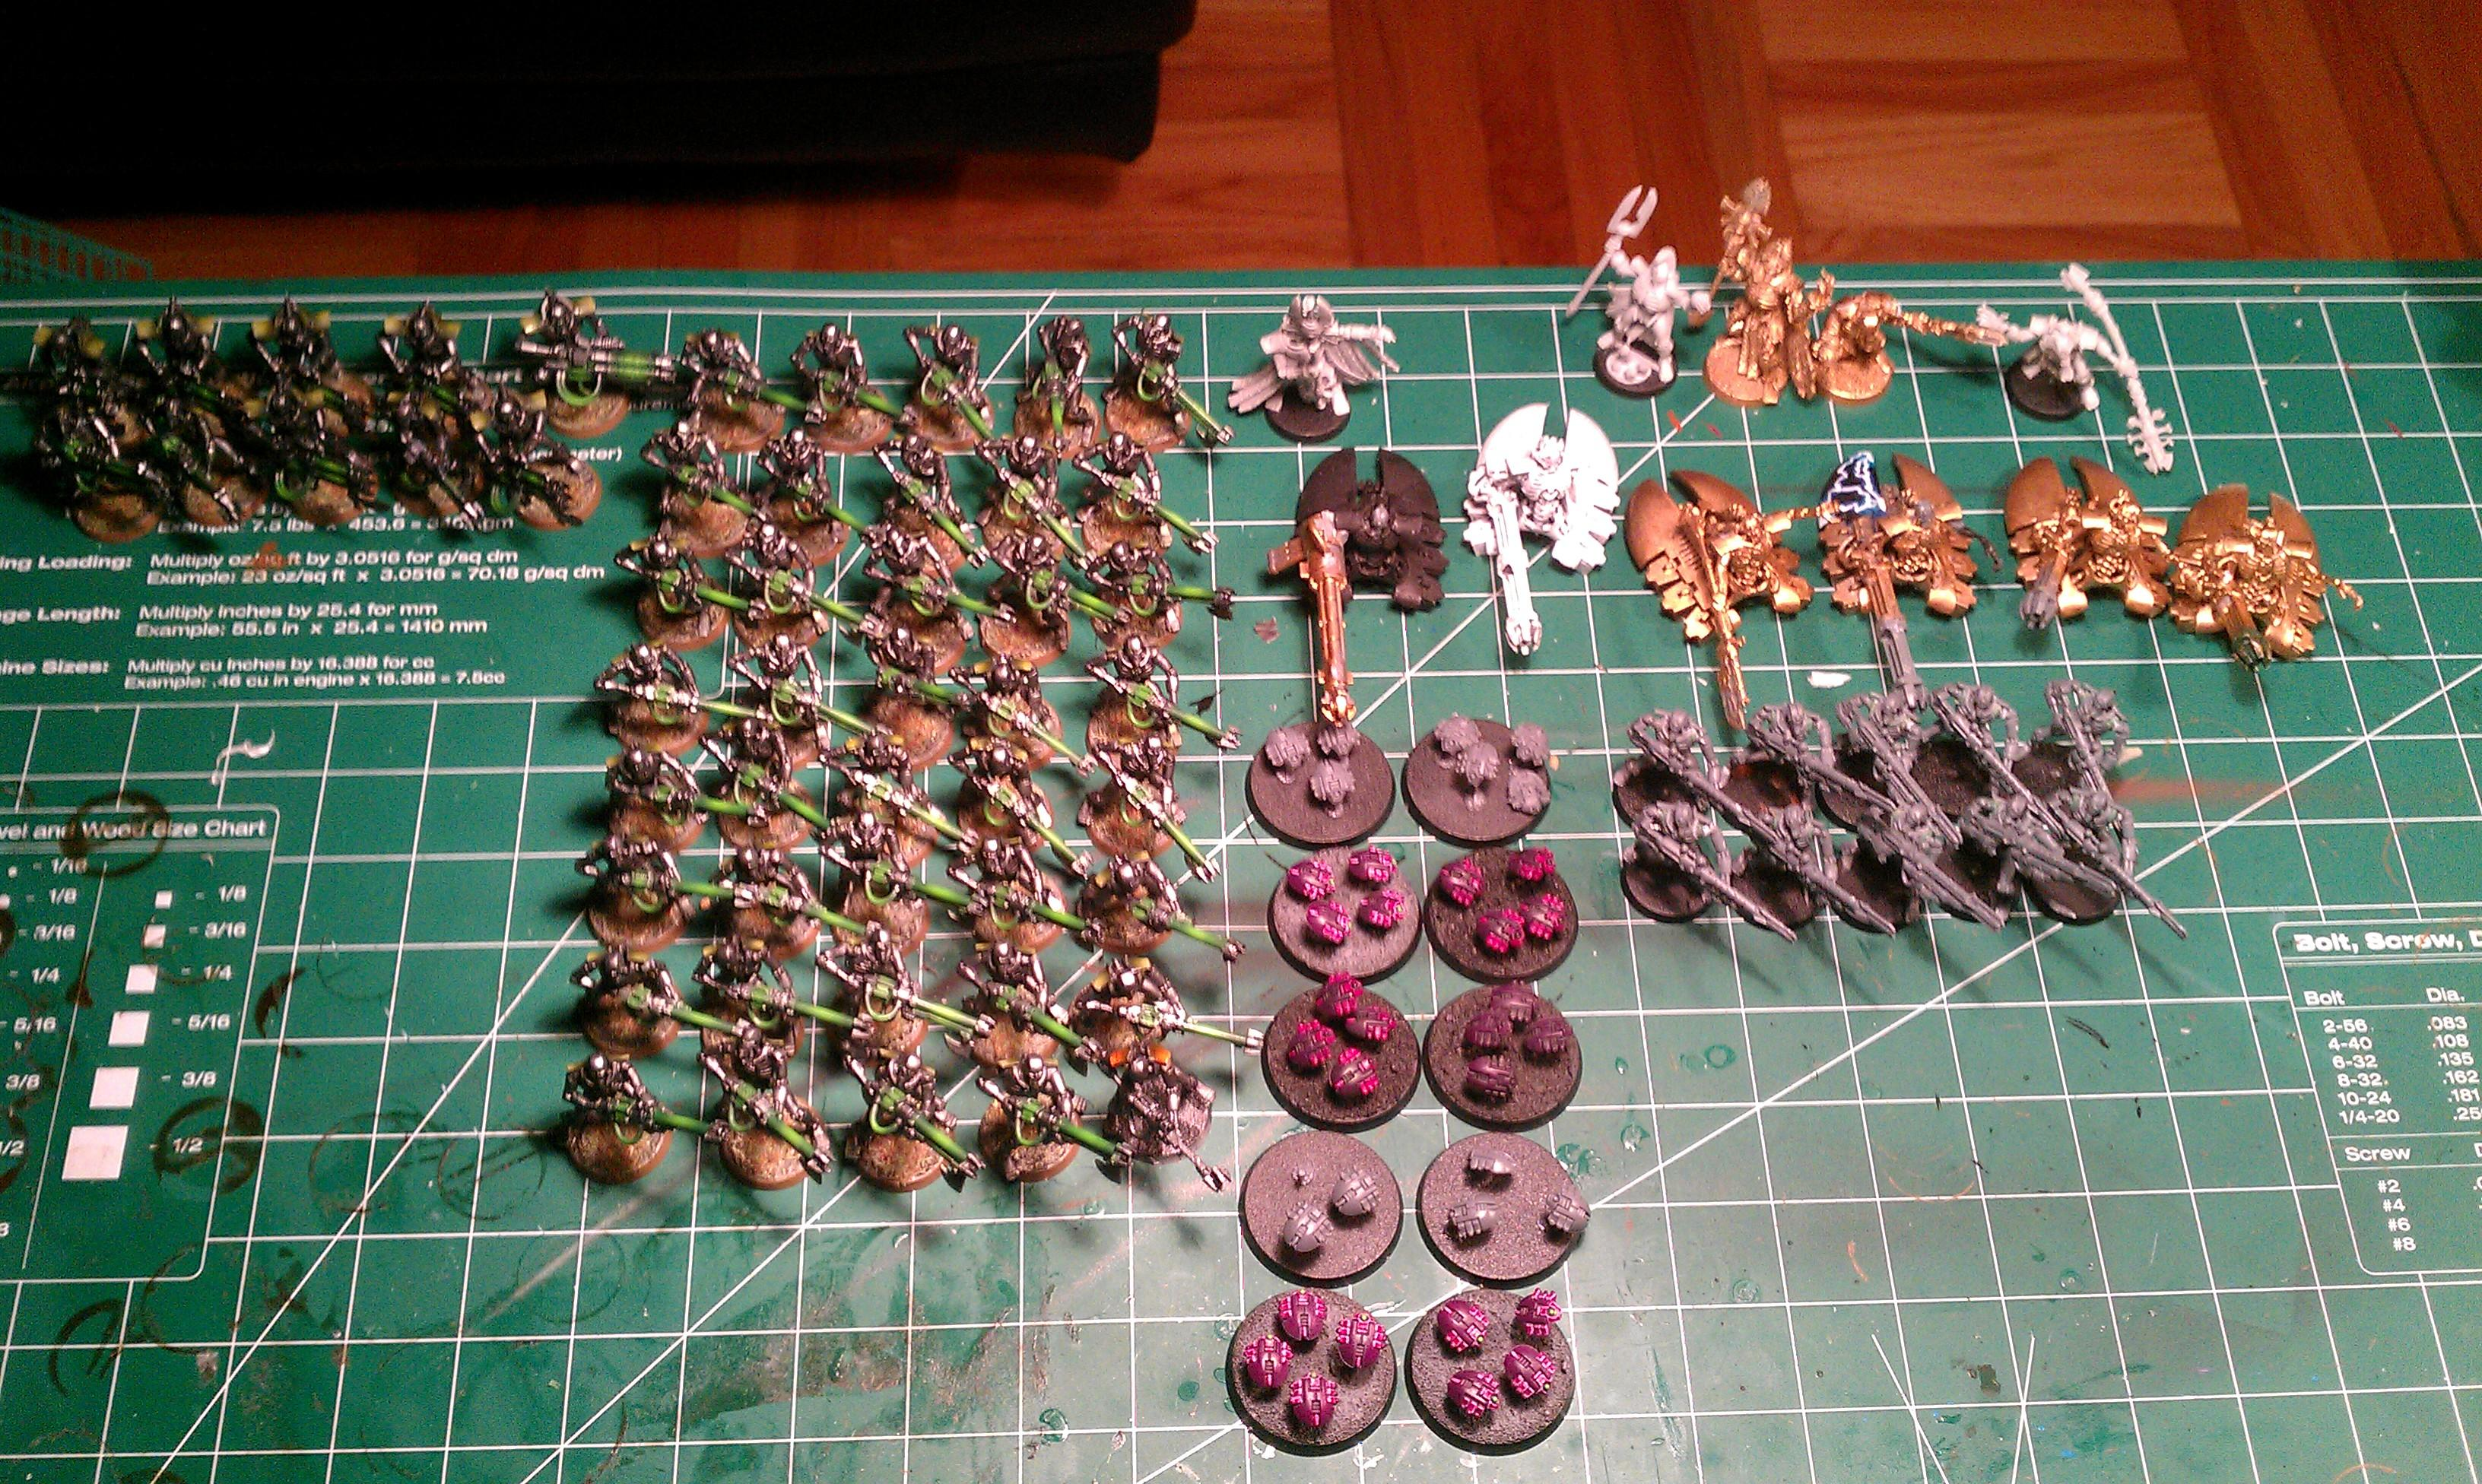 Warhammer 40,000, Full Army Shot